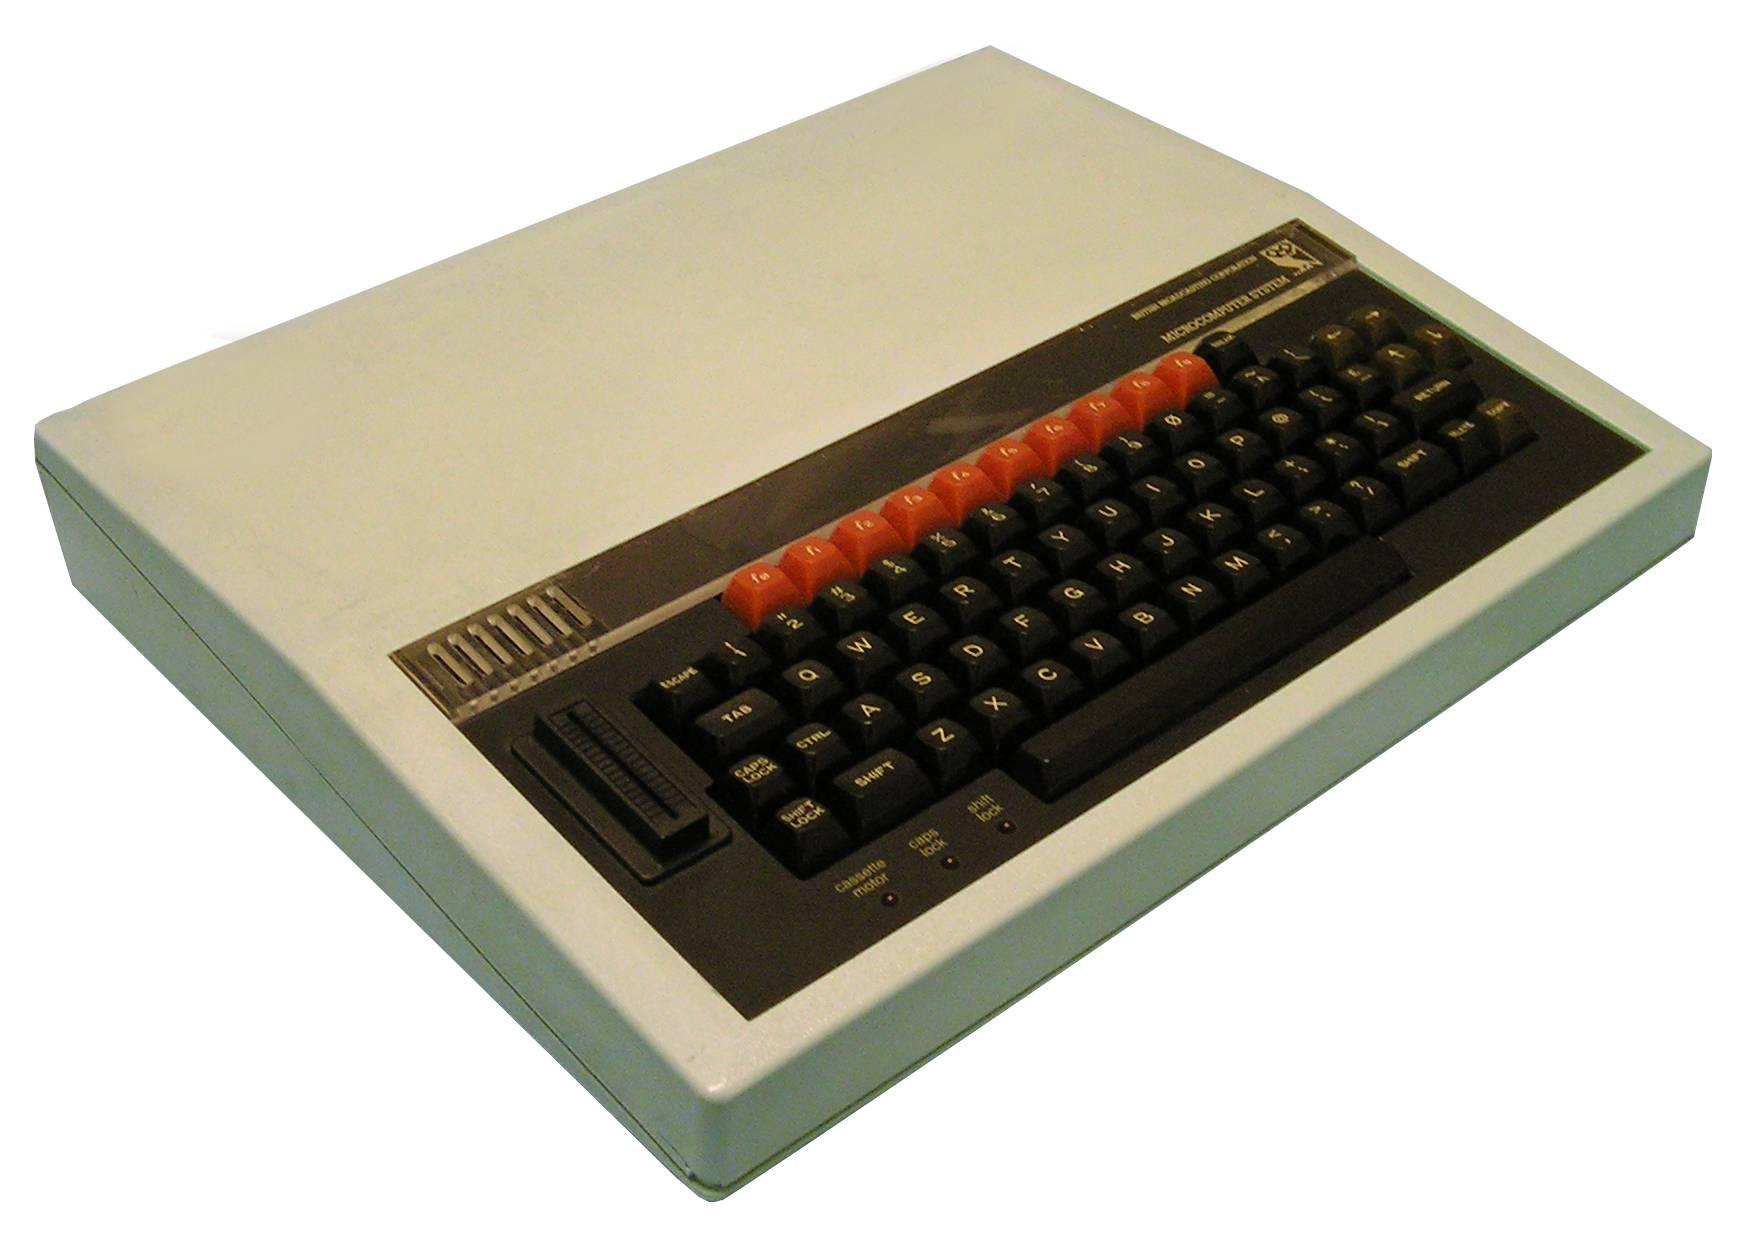 BBC Micro в Англии известен не меньше, чем ZX Spectrum